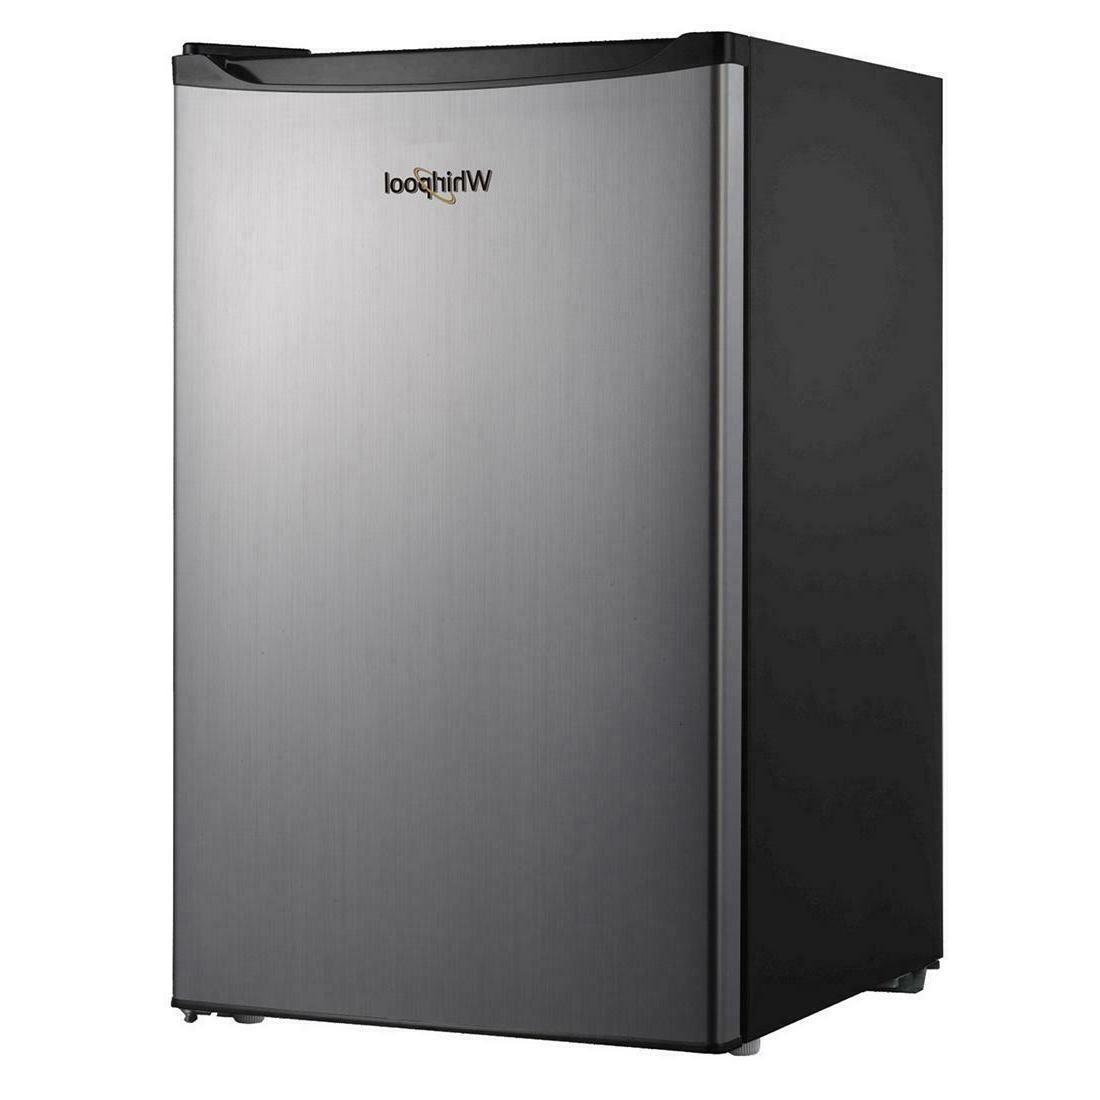 Whirlpool 4.3 cu ft Compact Mini Fridge Freezer Refrigerator